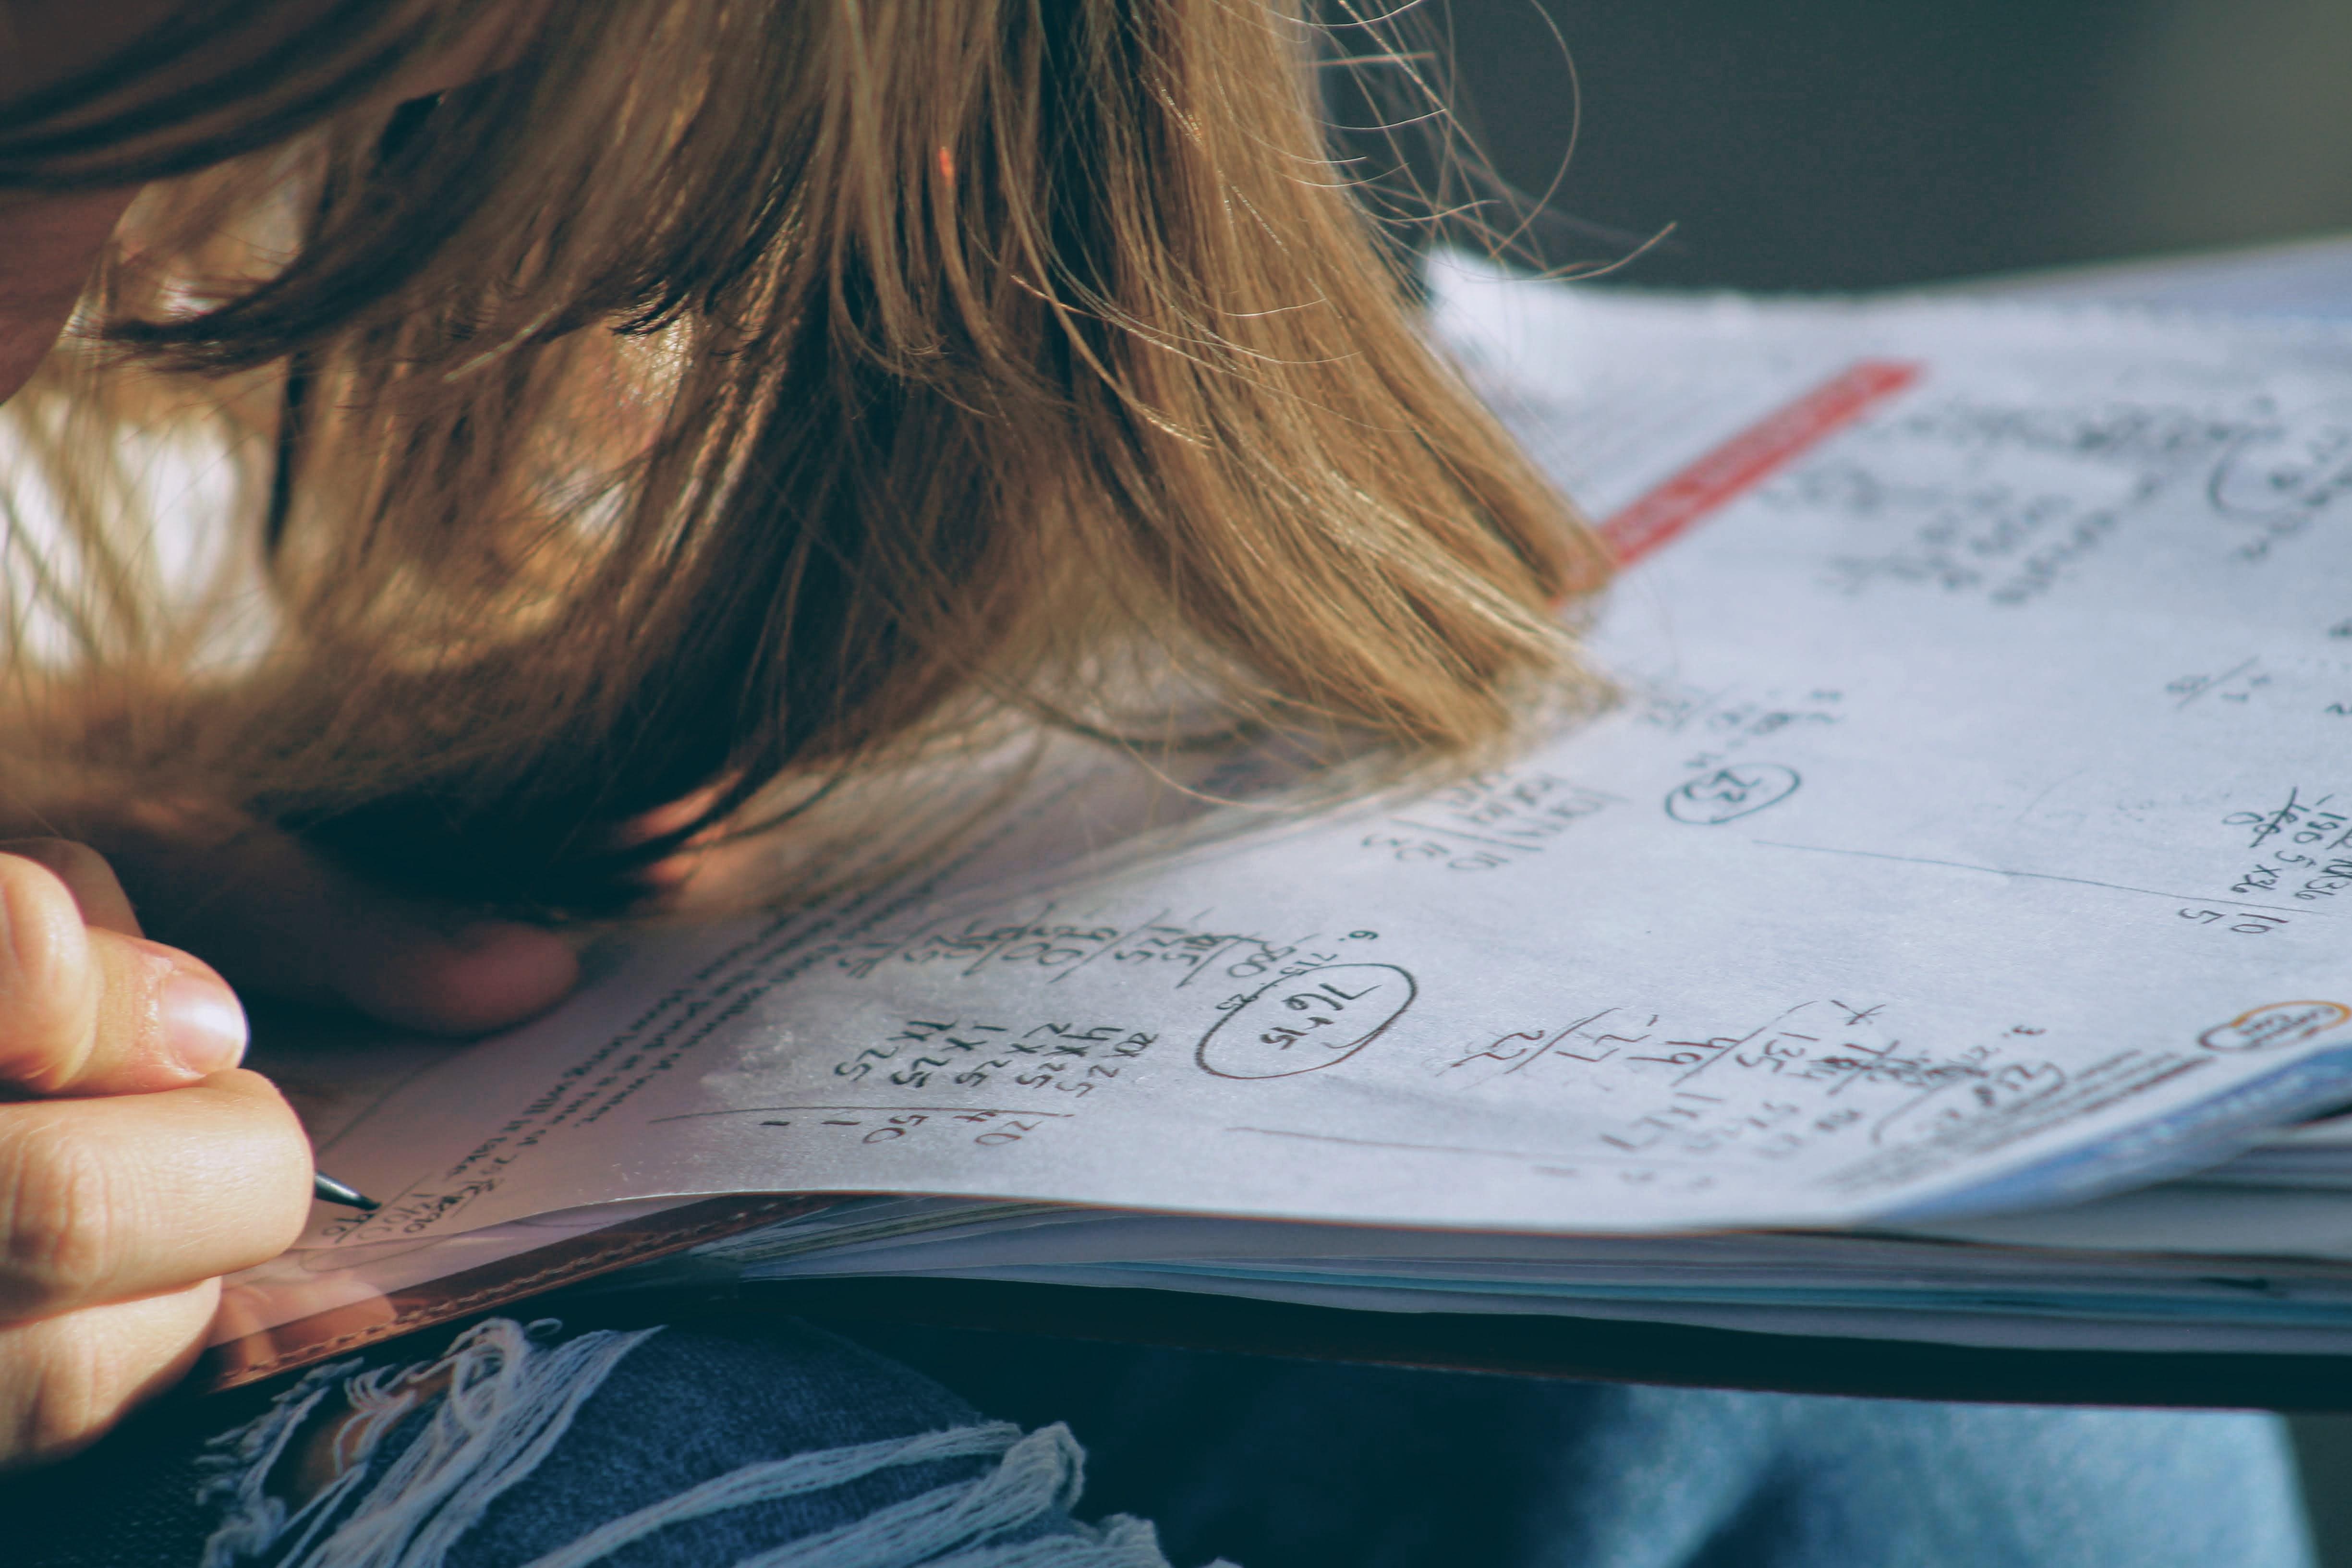 A student's hair over math homewor. Photo courtesy of Joshua Hoehne on Unsplash.